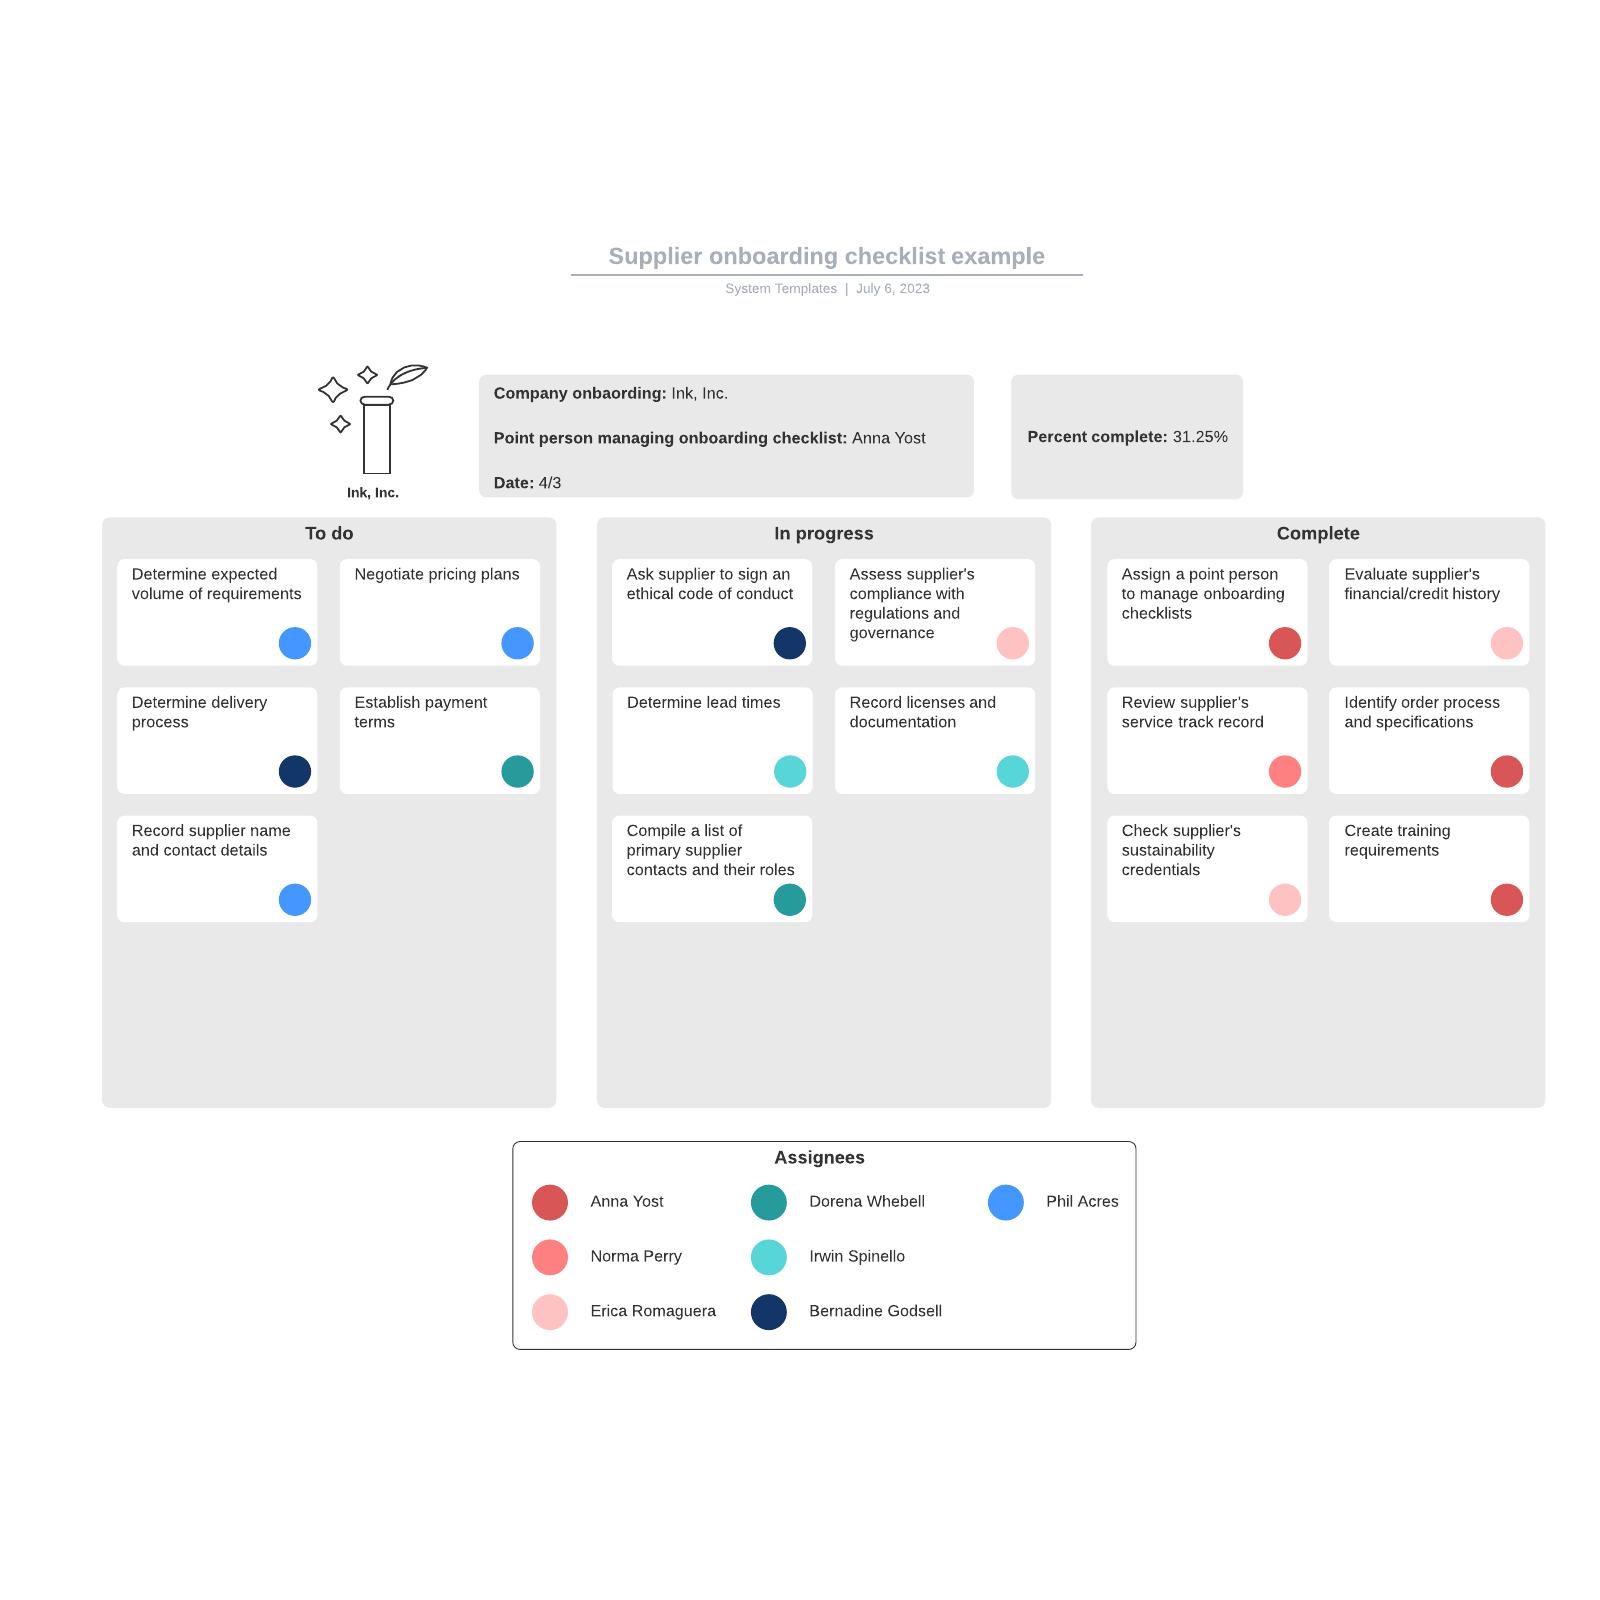 Supplier onboarding checklist example